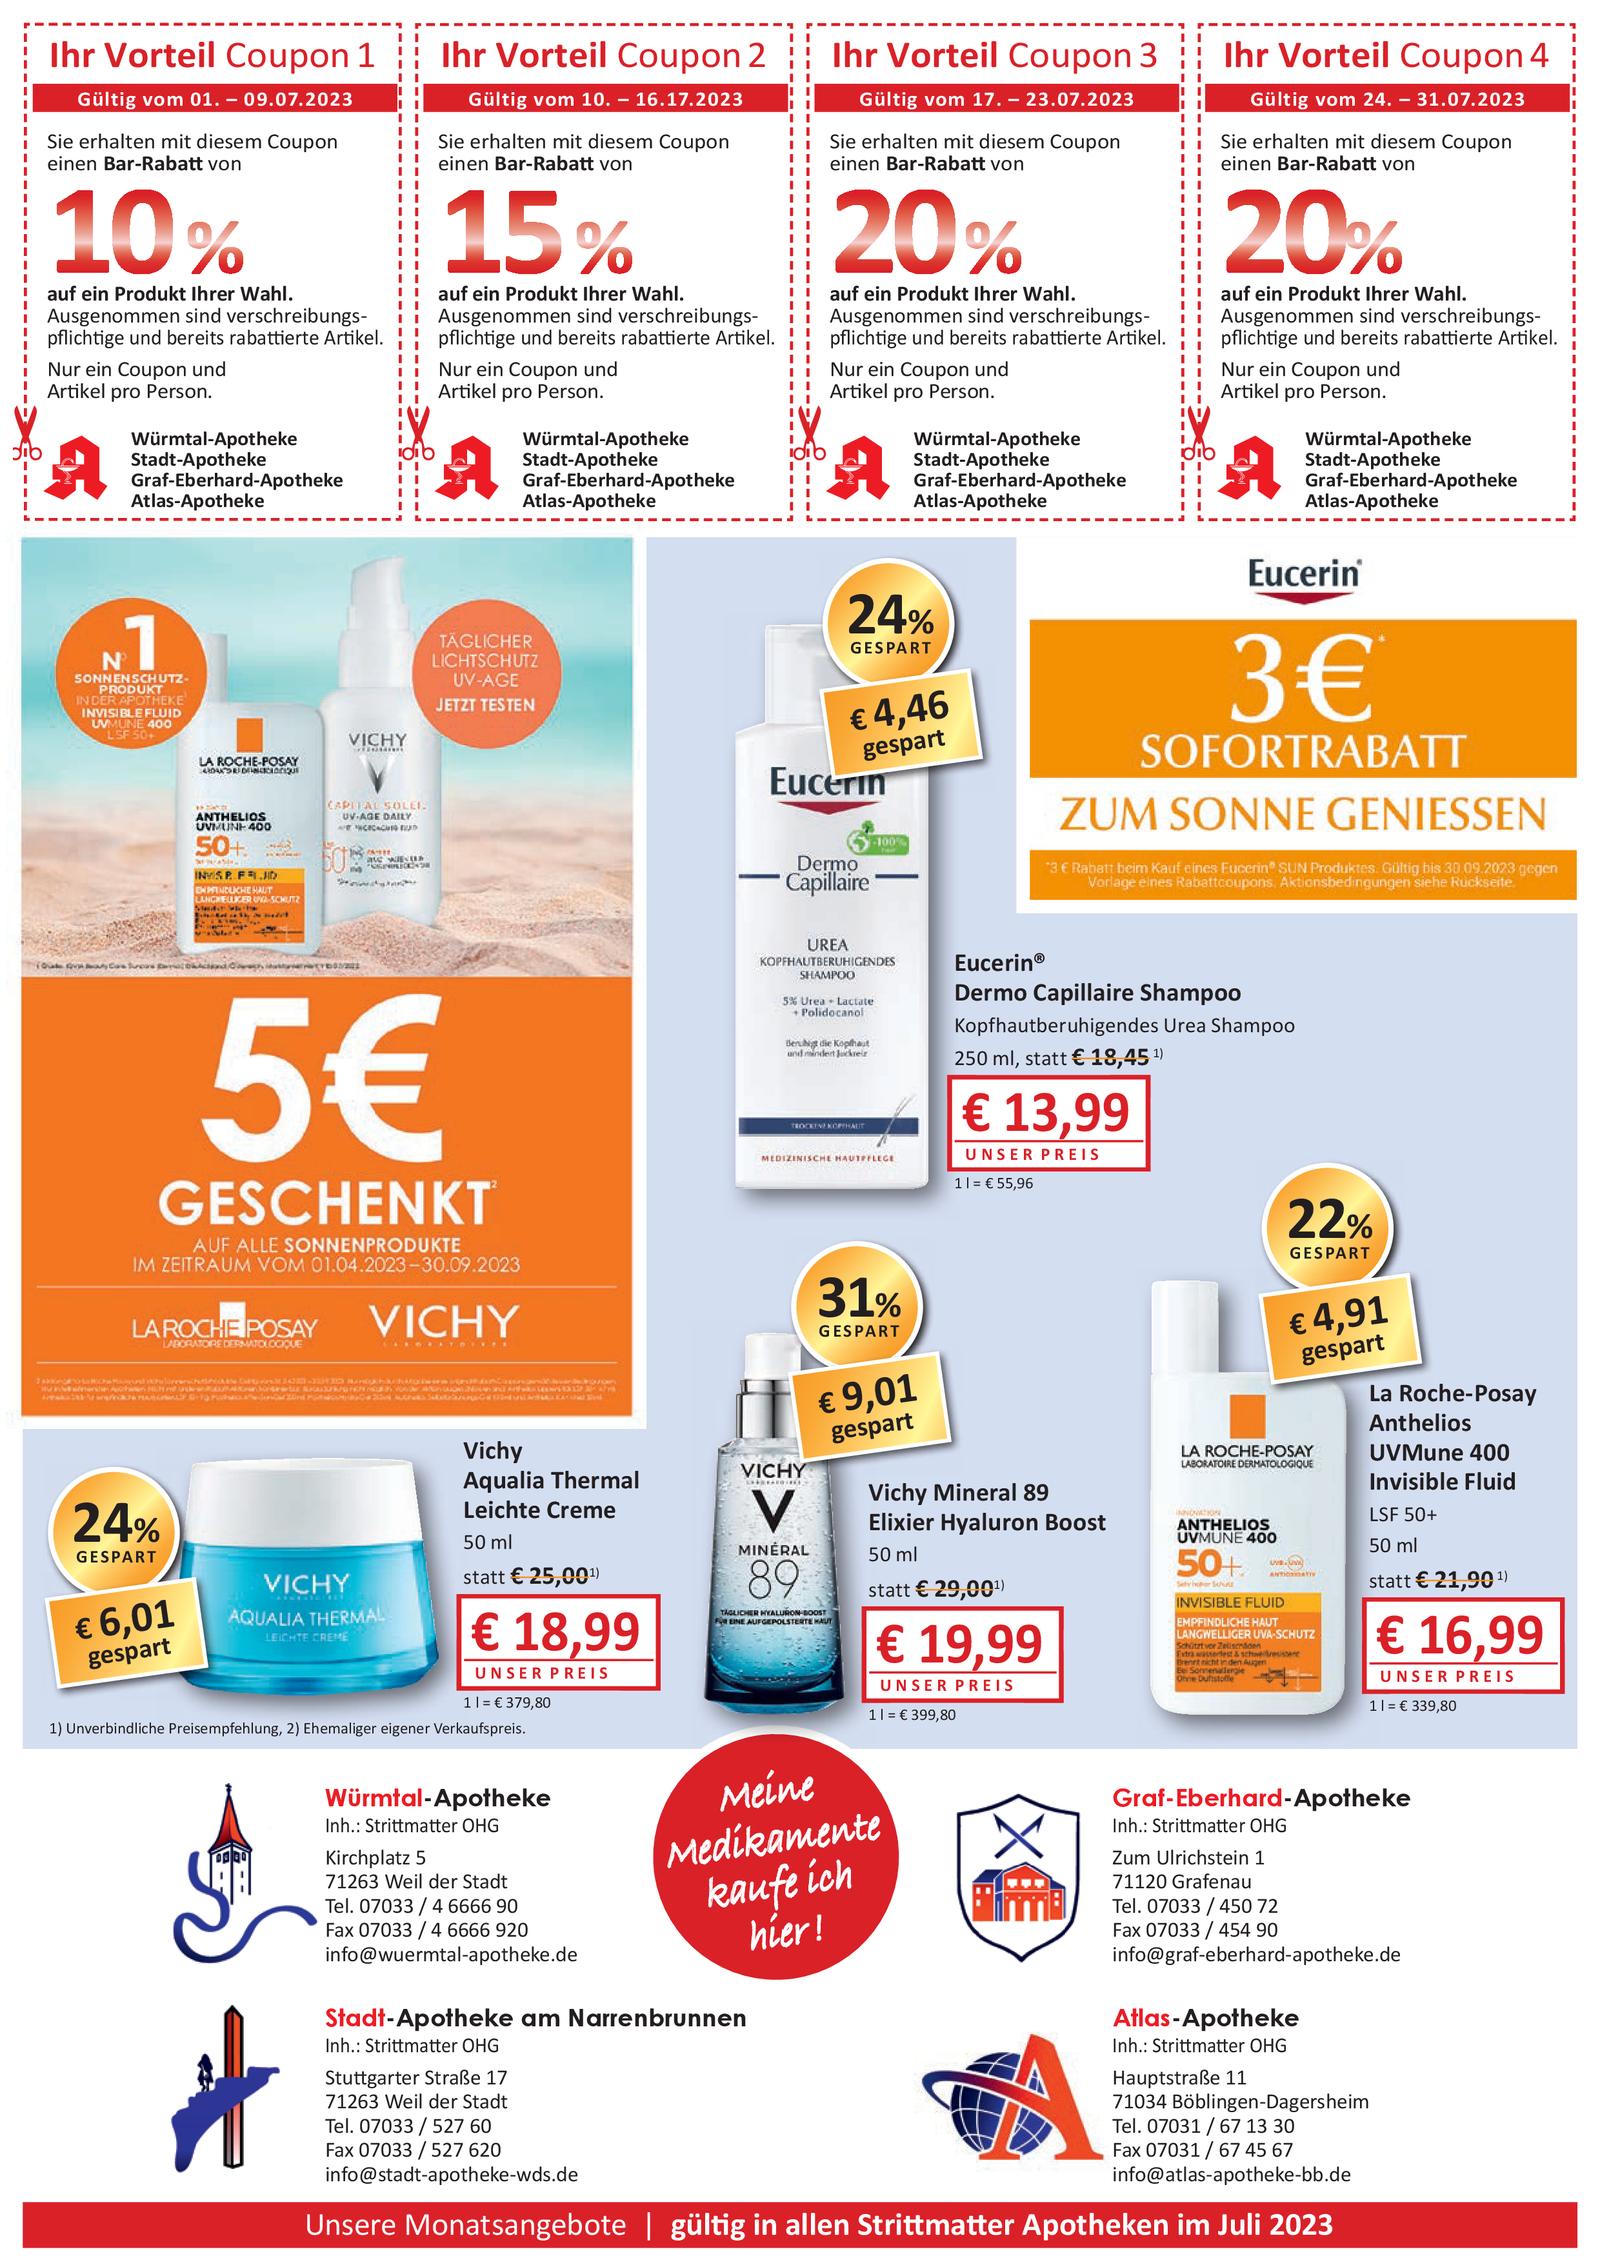 https://mein-uploads.apocdn.net/16786/leaflets/16786_flyer-Seite4.png